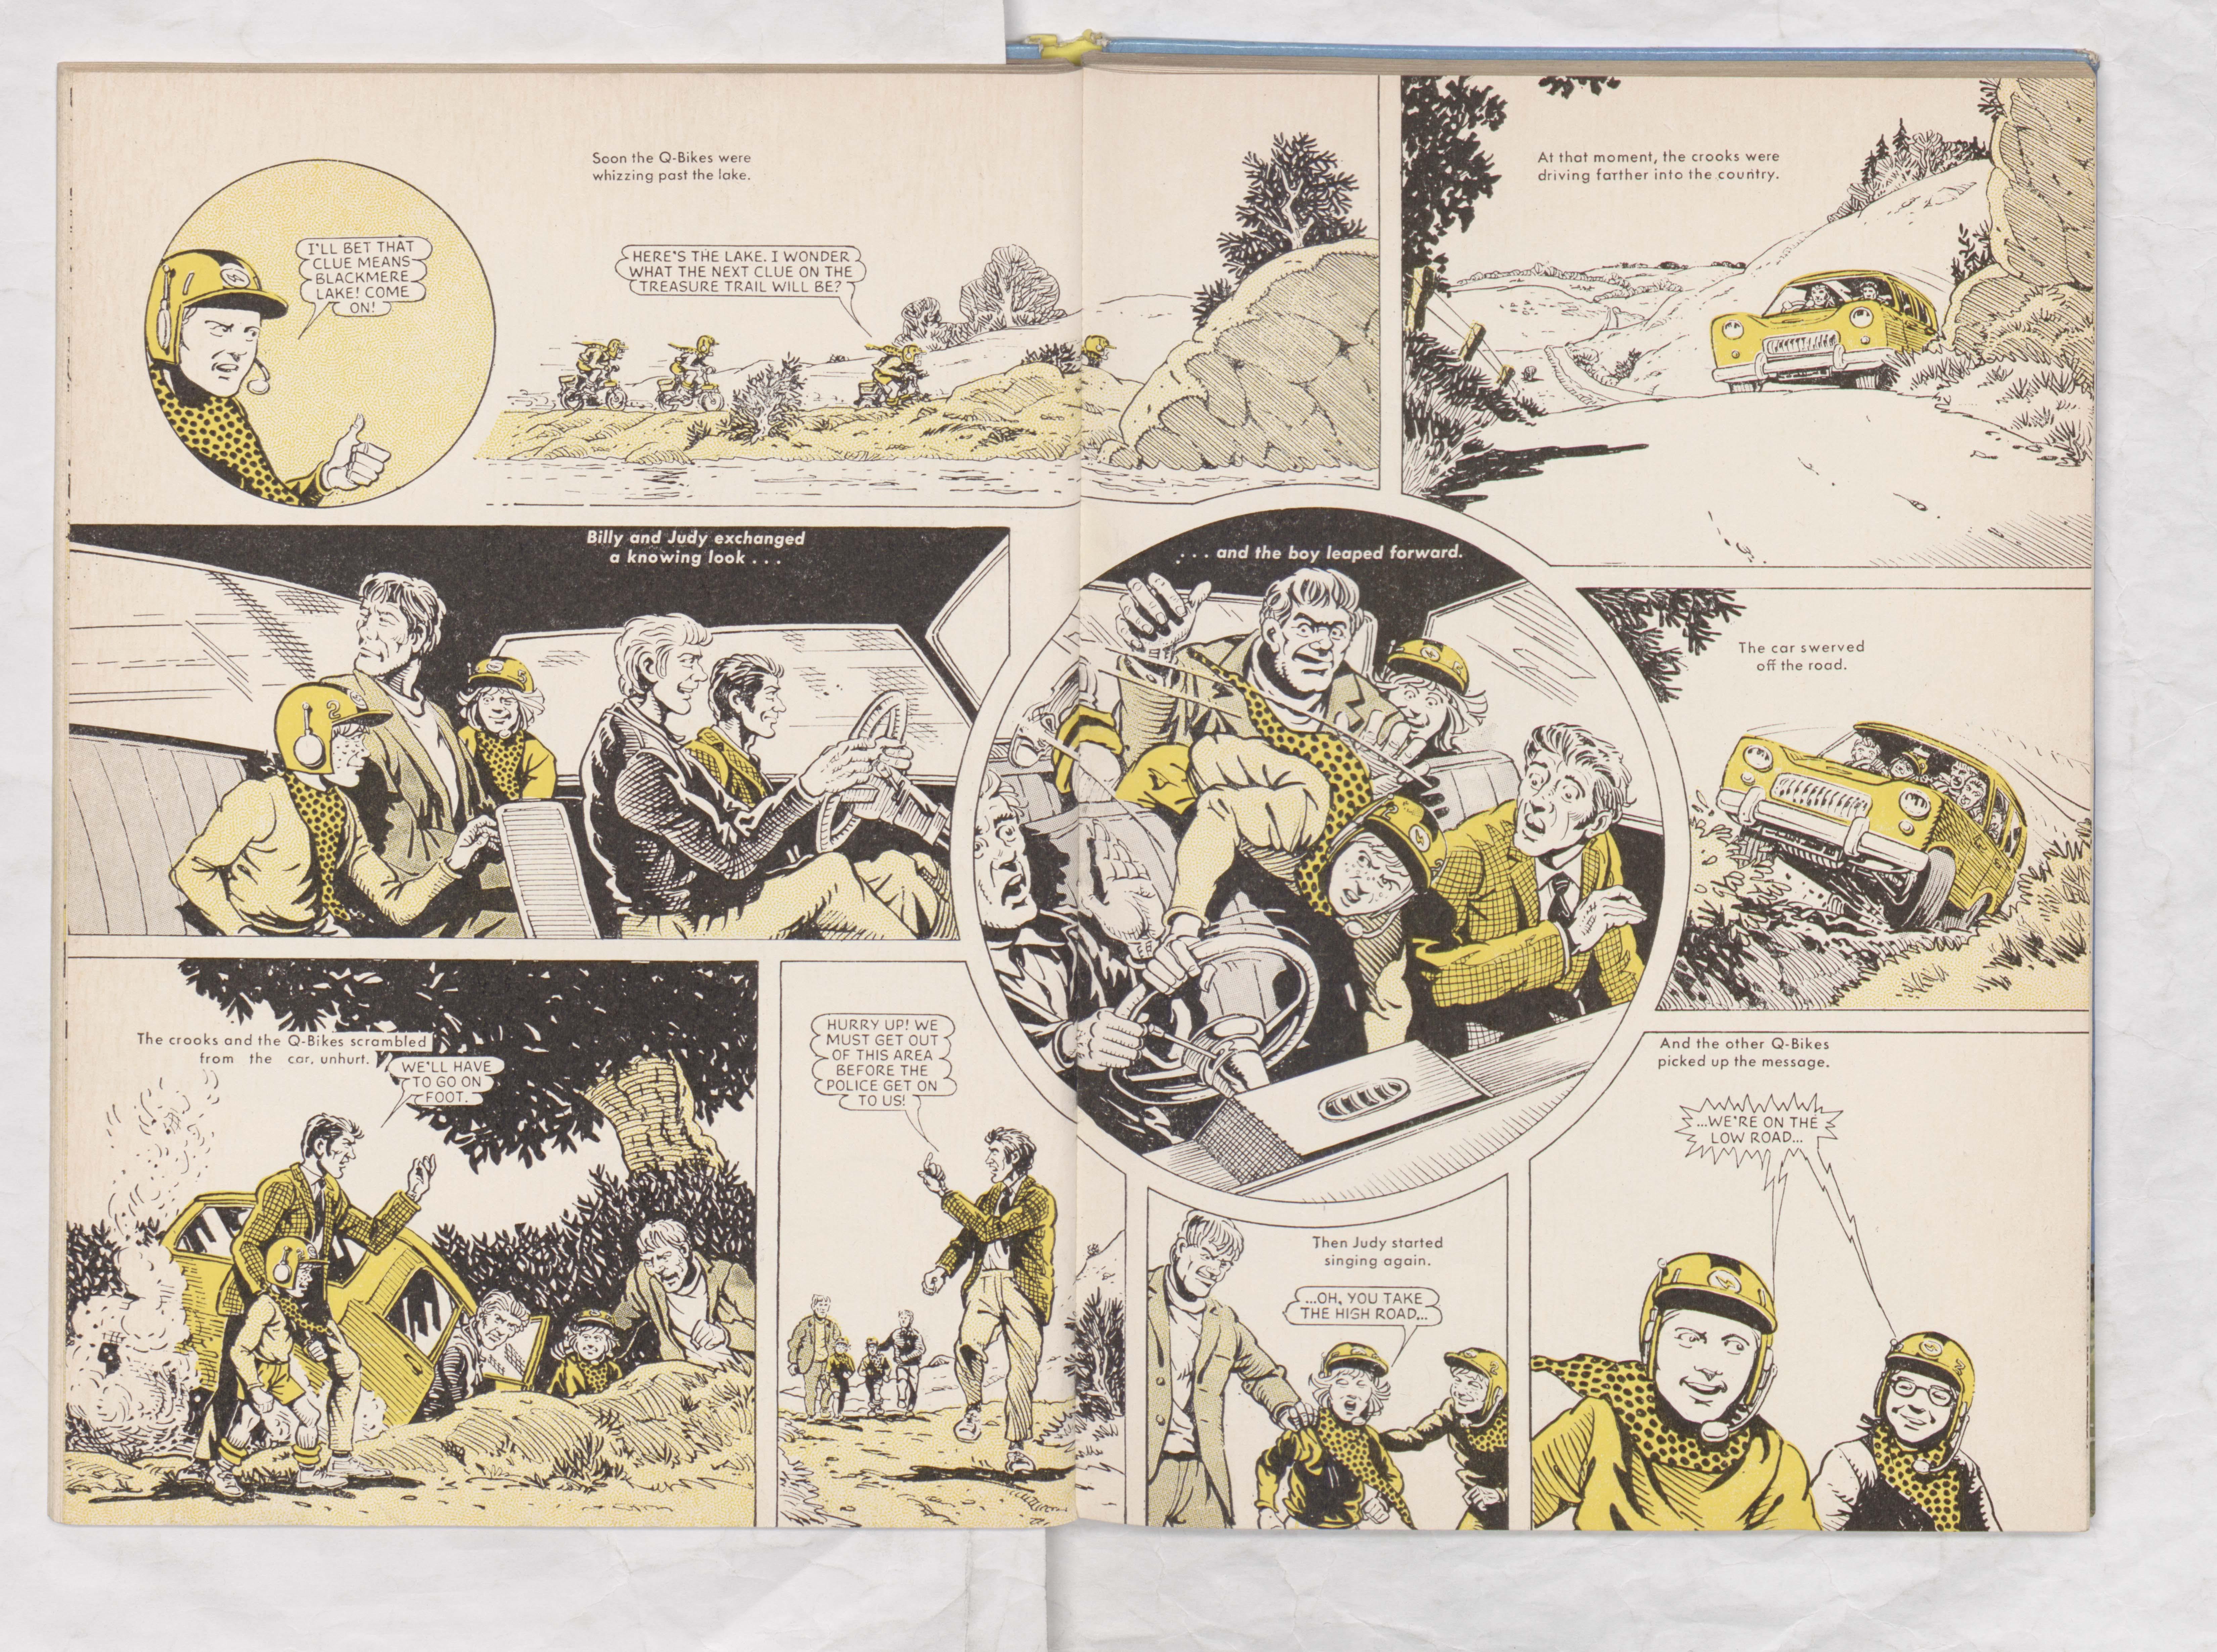 Beano Book 1970 - Q-Bikes - Page 6 + 7